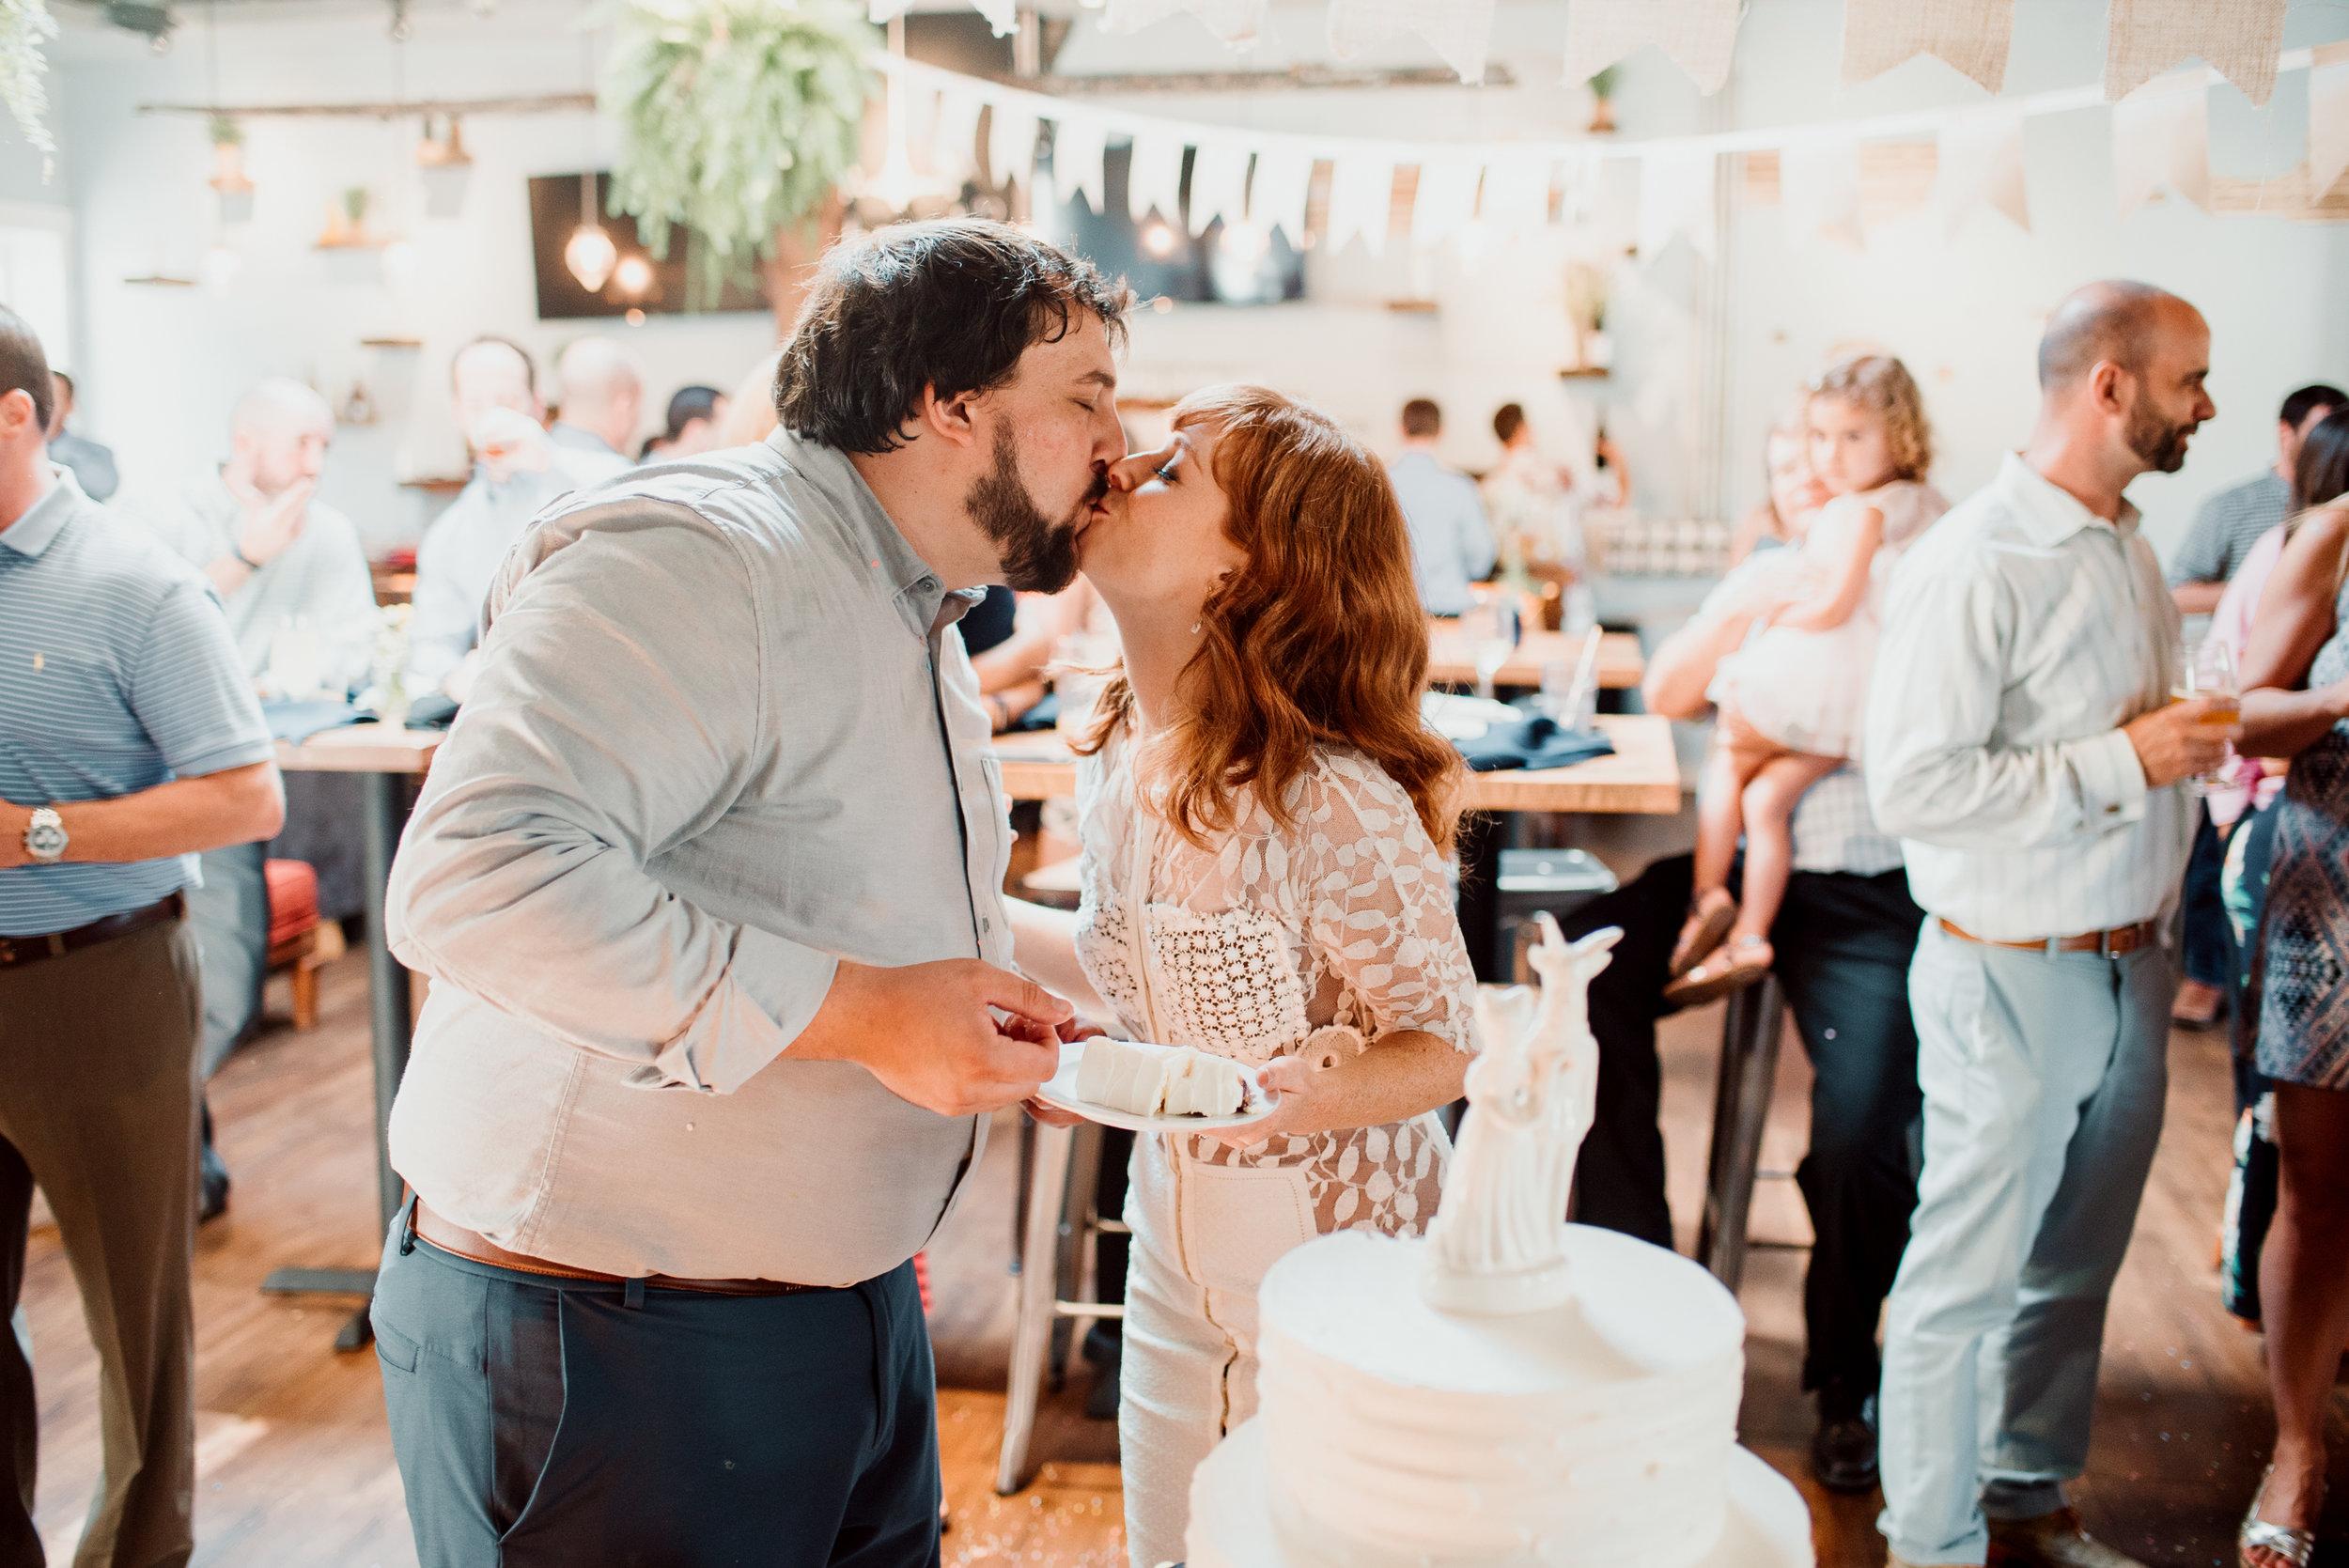 Philadelphia-wedding-photographer-la-cabra-brewery-diy-Peaberry-Photography-049.jpg